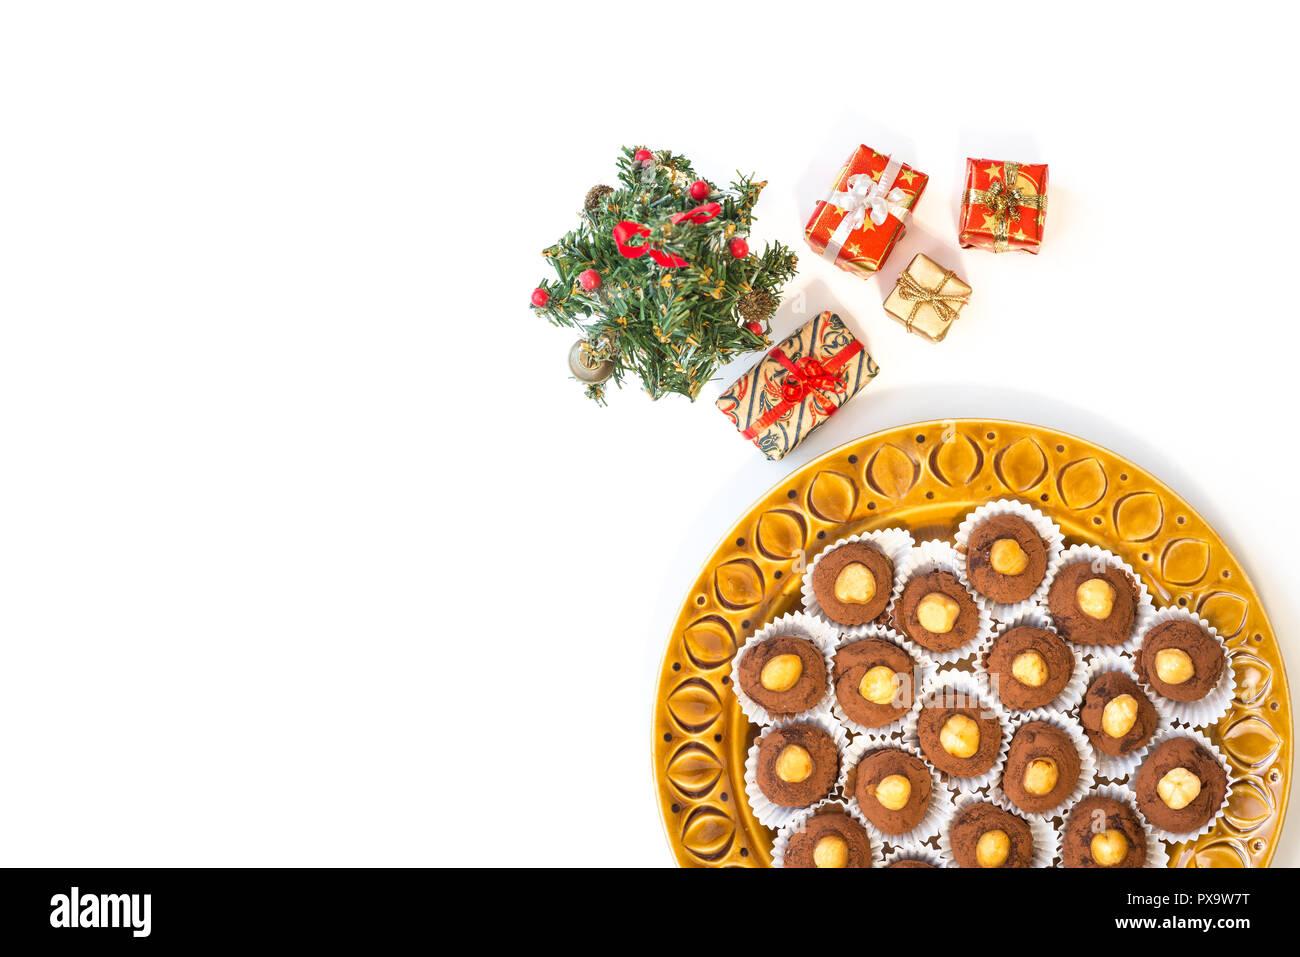 Homemade christmas dessert; chocolate bonbons with chopped hazelnuts, white background - Stock Image